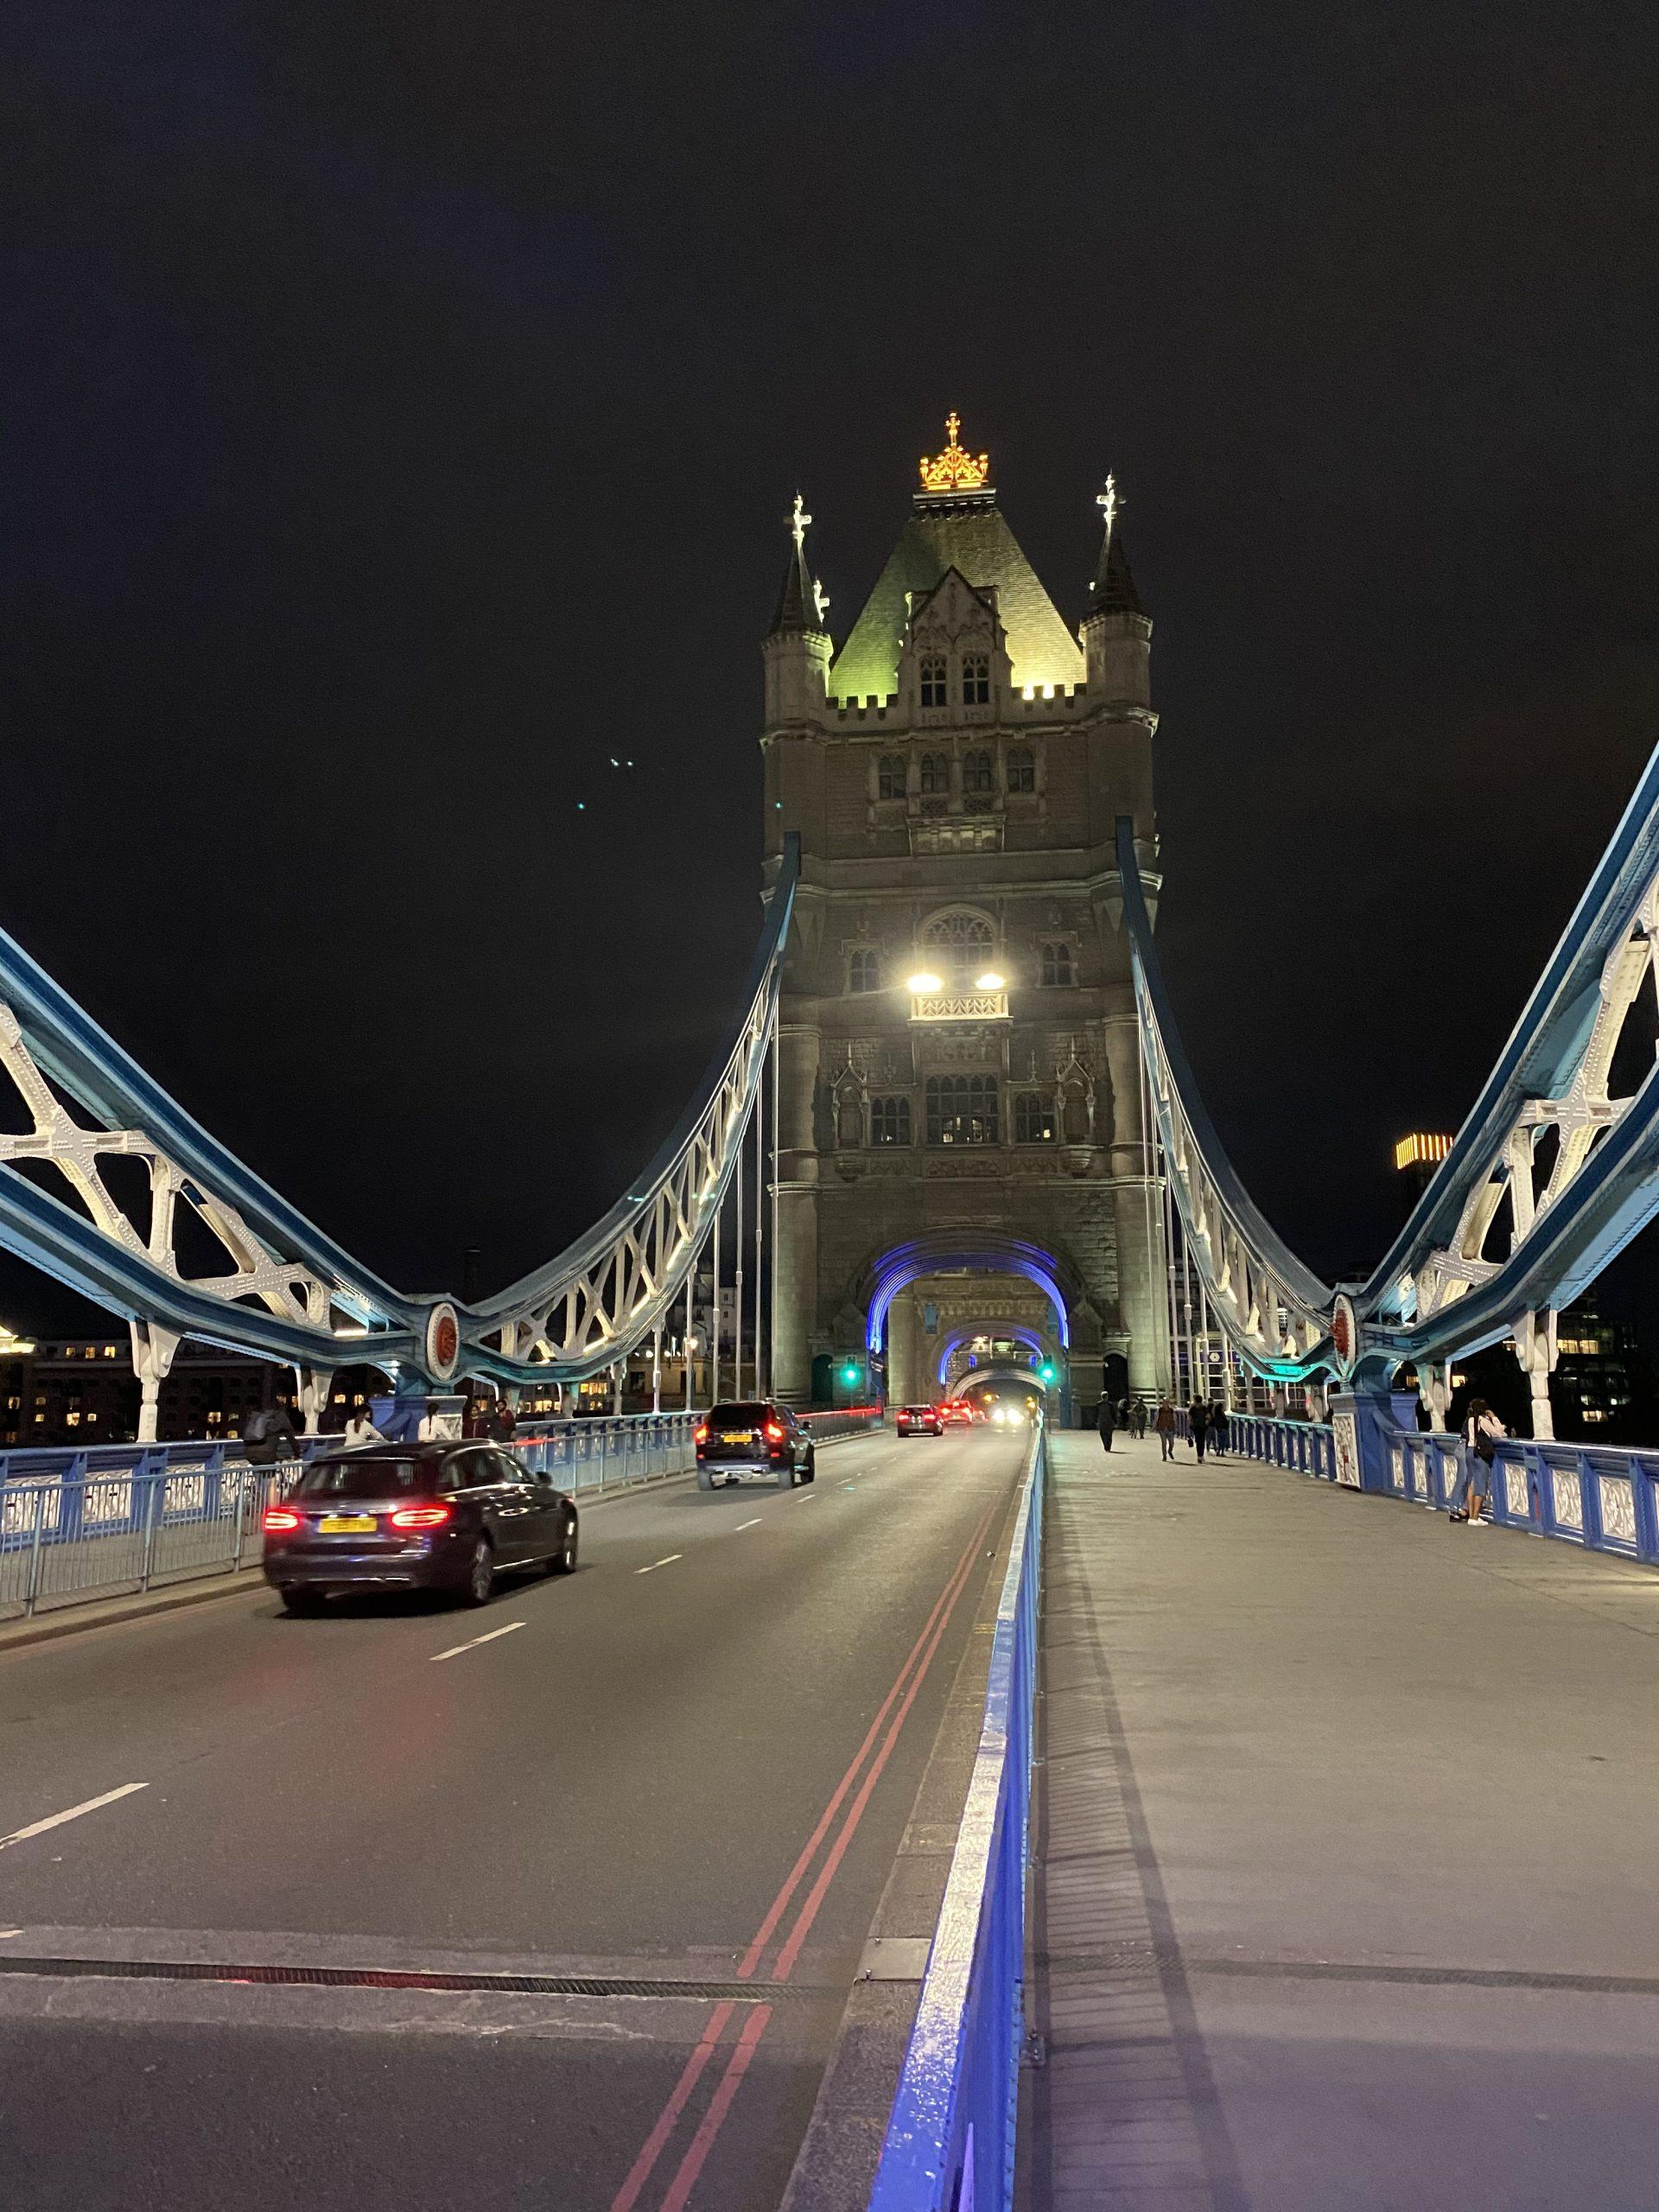 Tower Bridge in Night